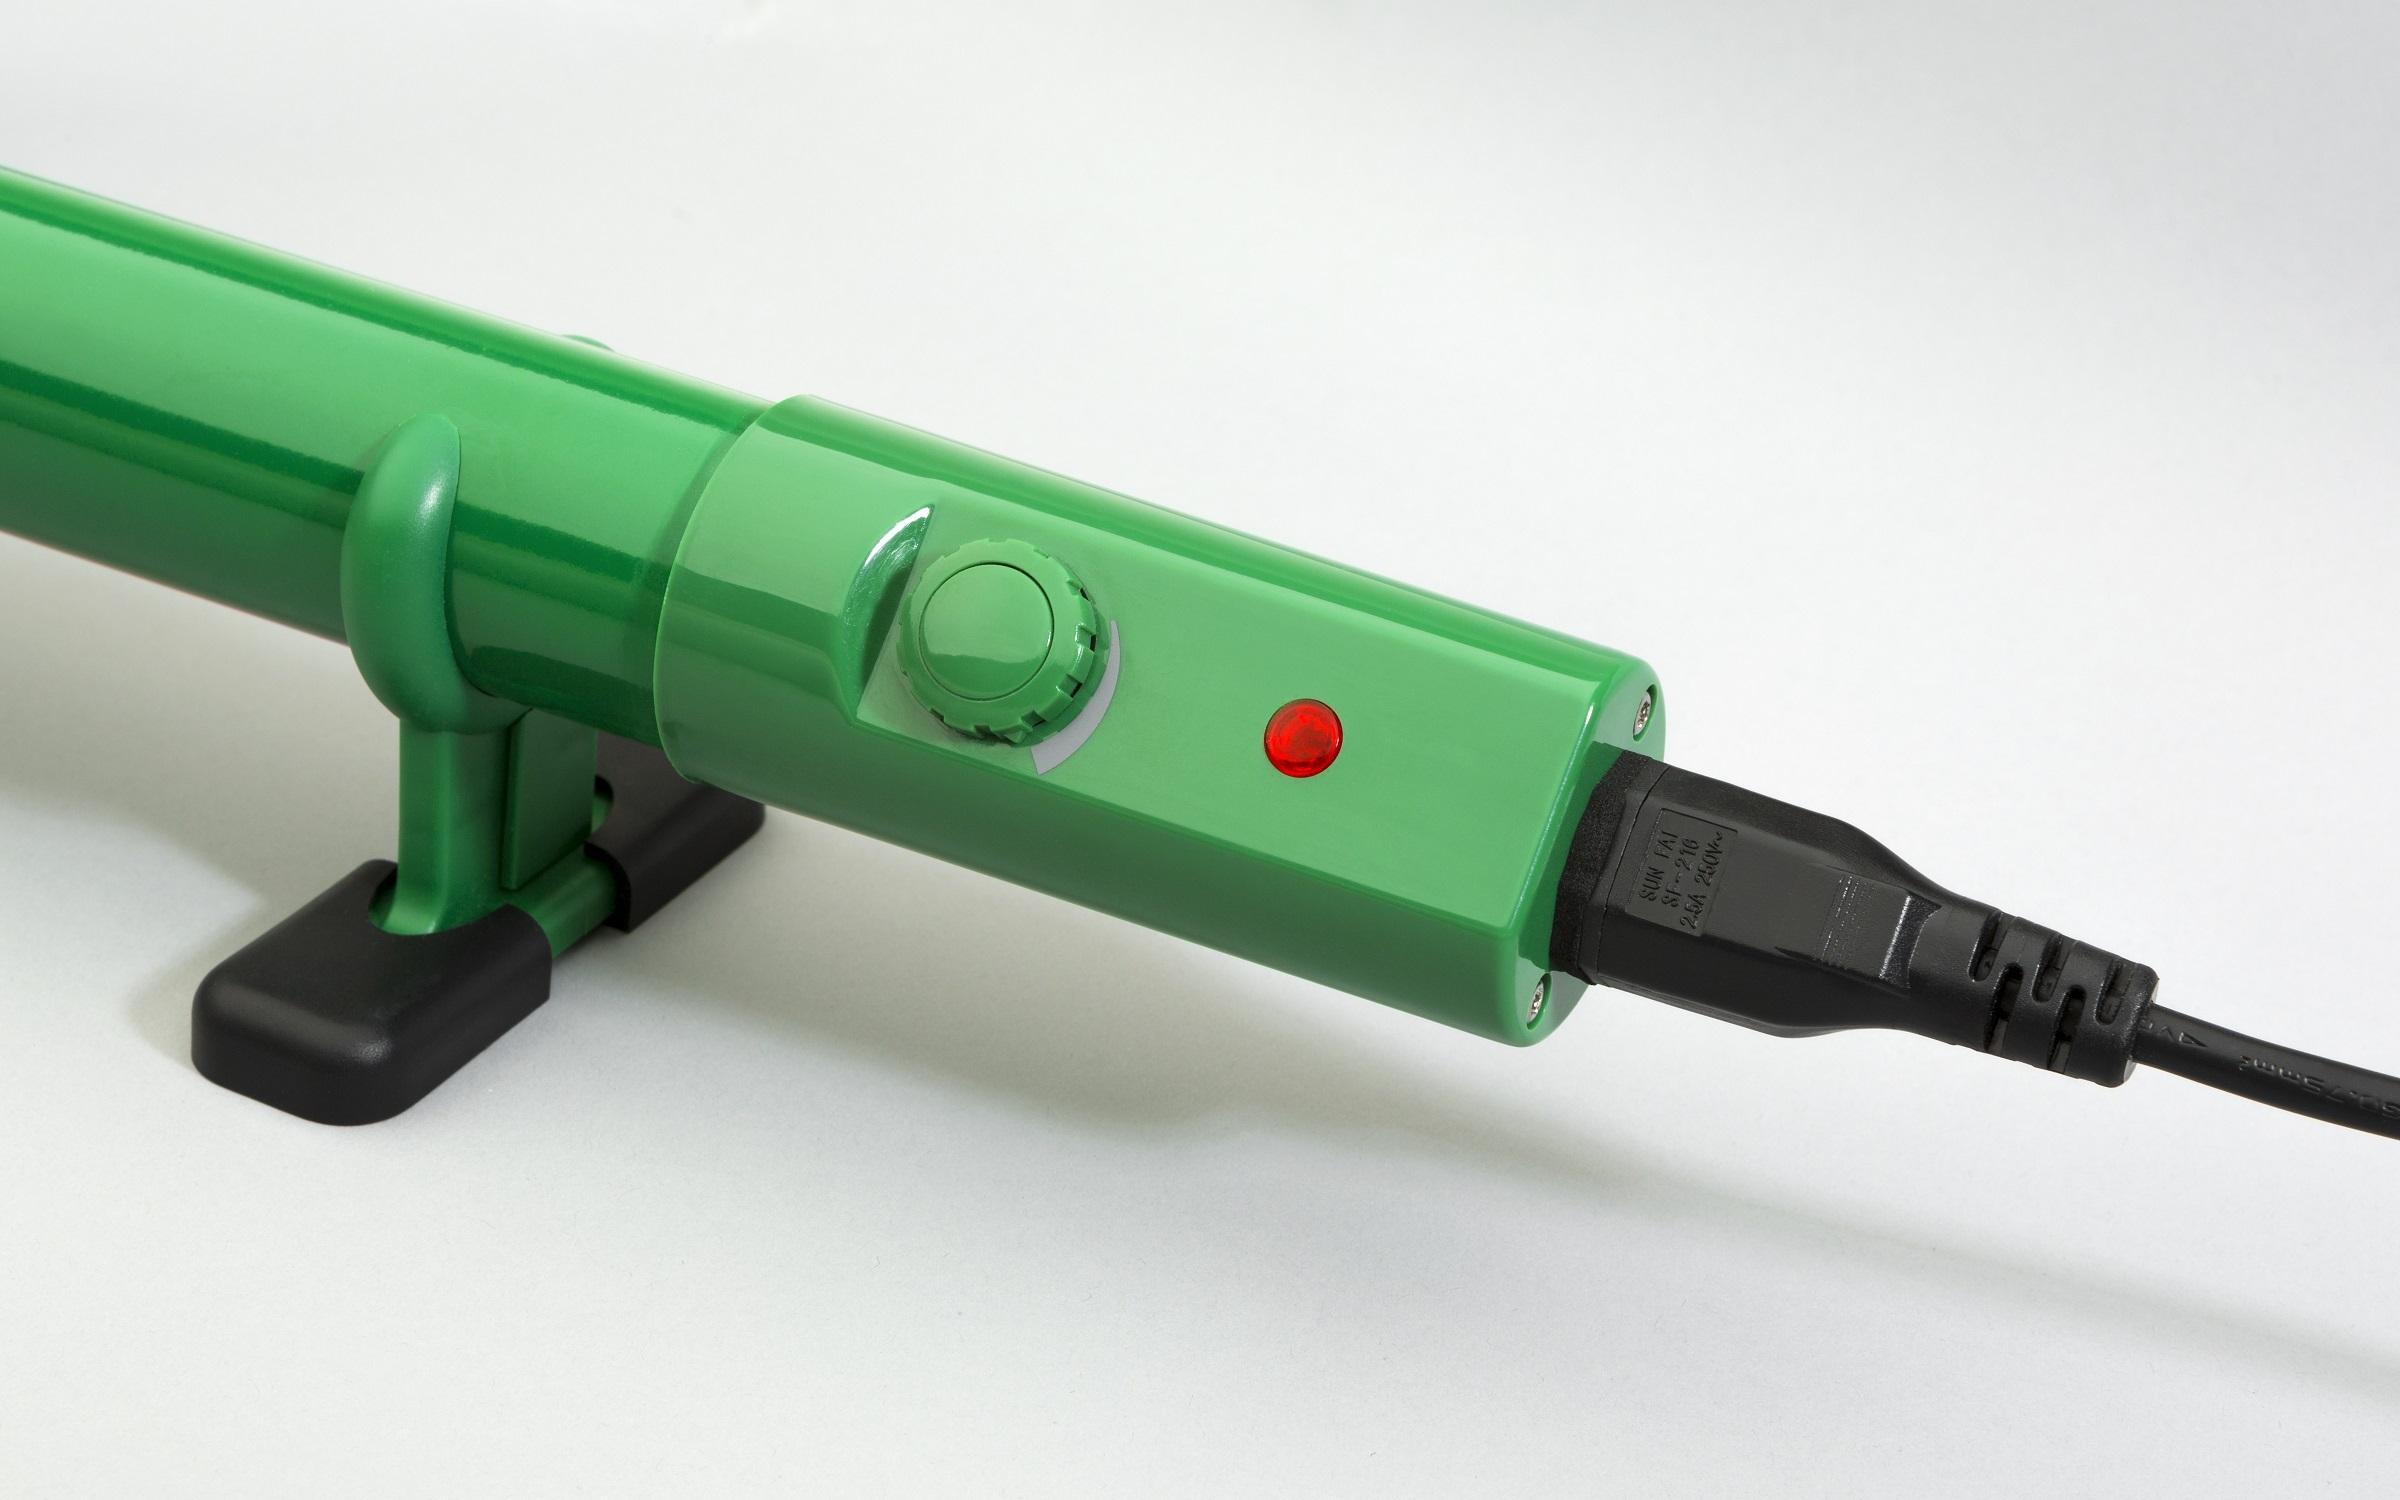 Hylite Slimline Green Eco Heater 55w Tube Heater With